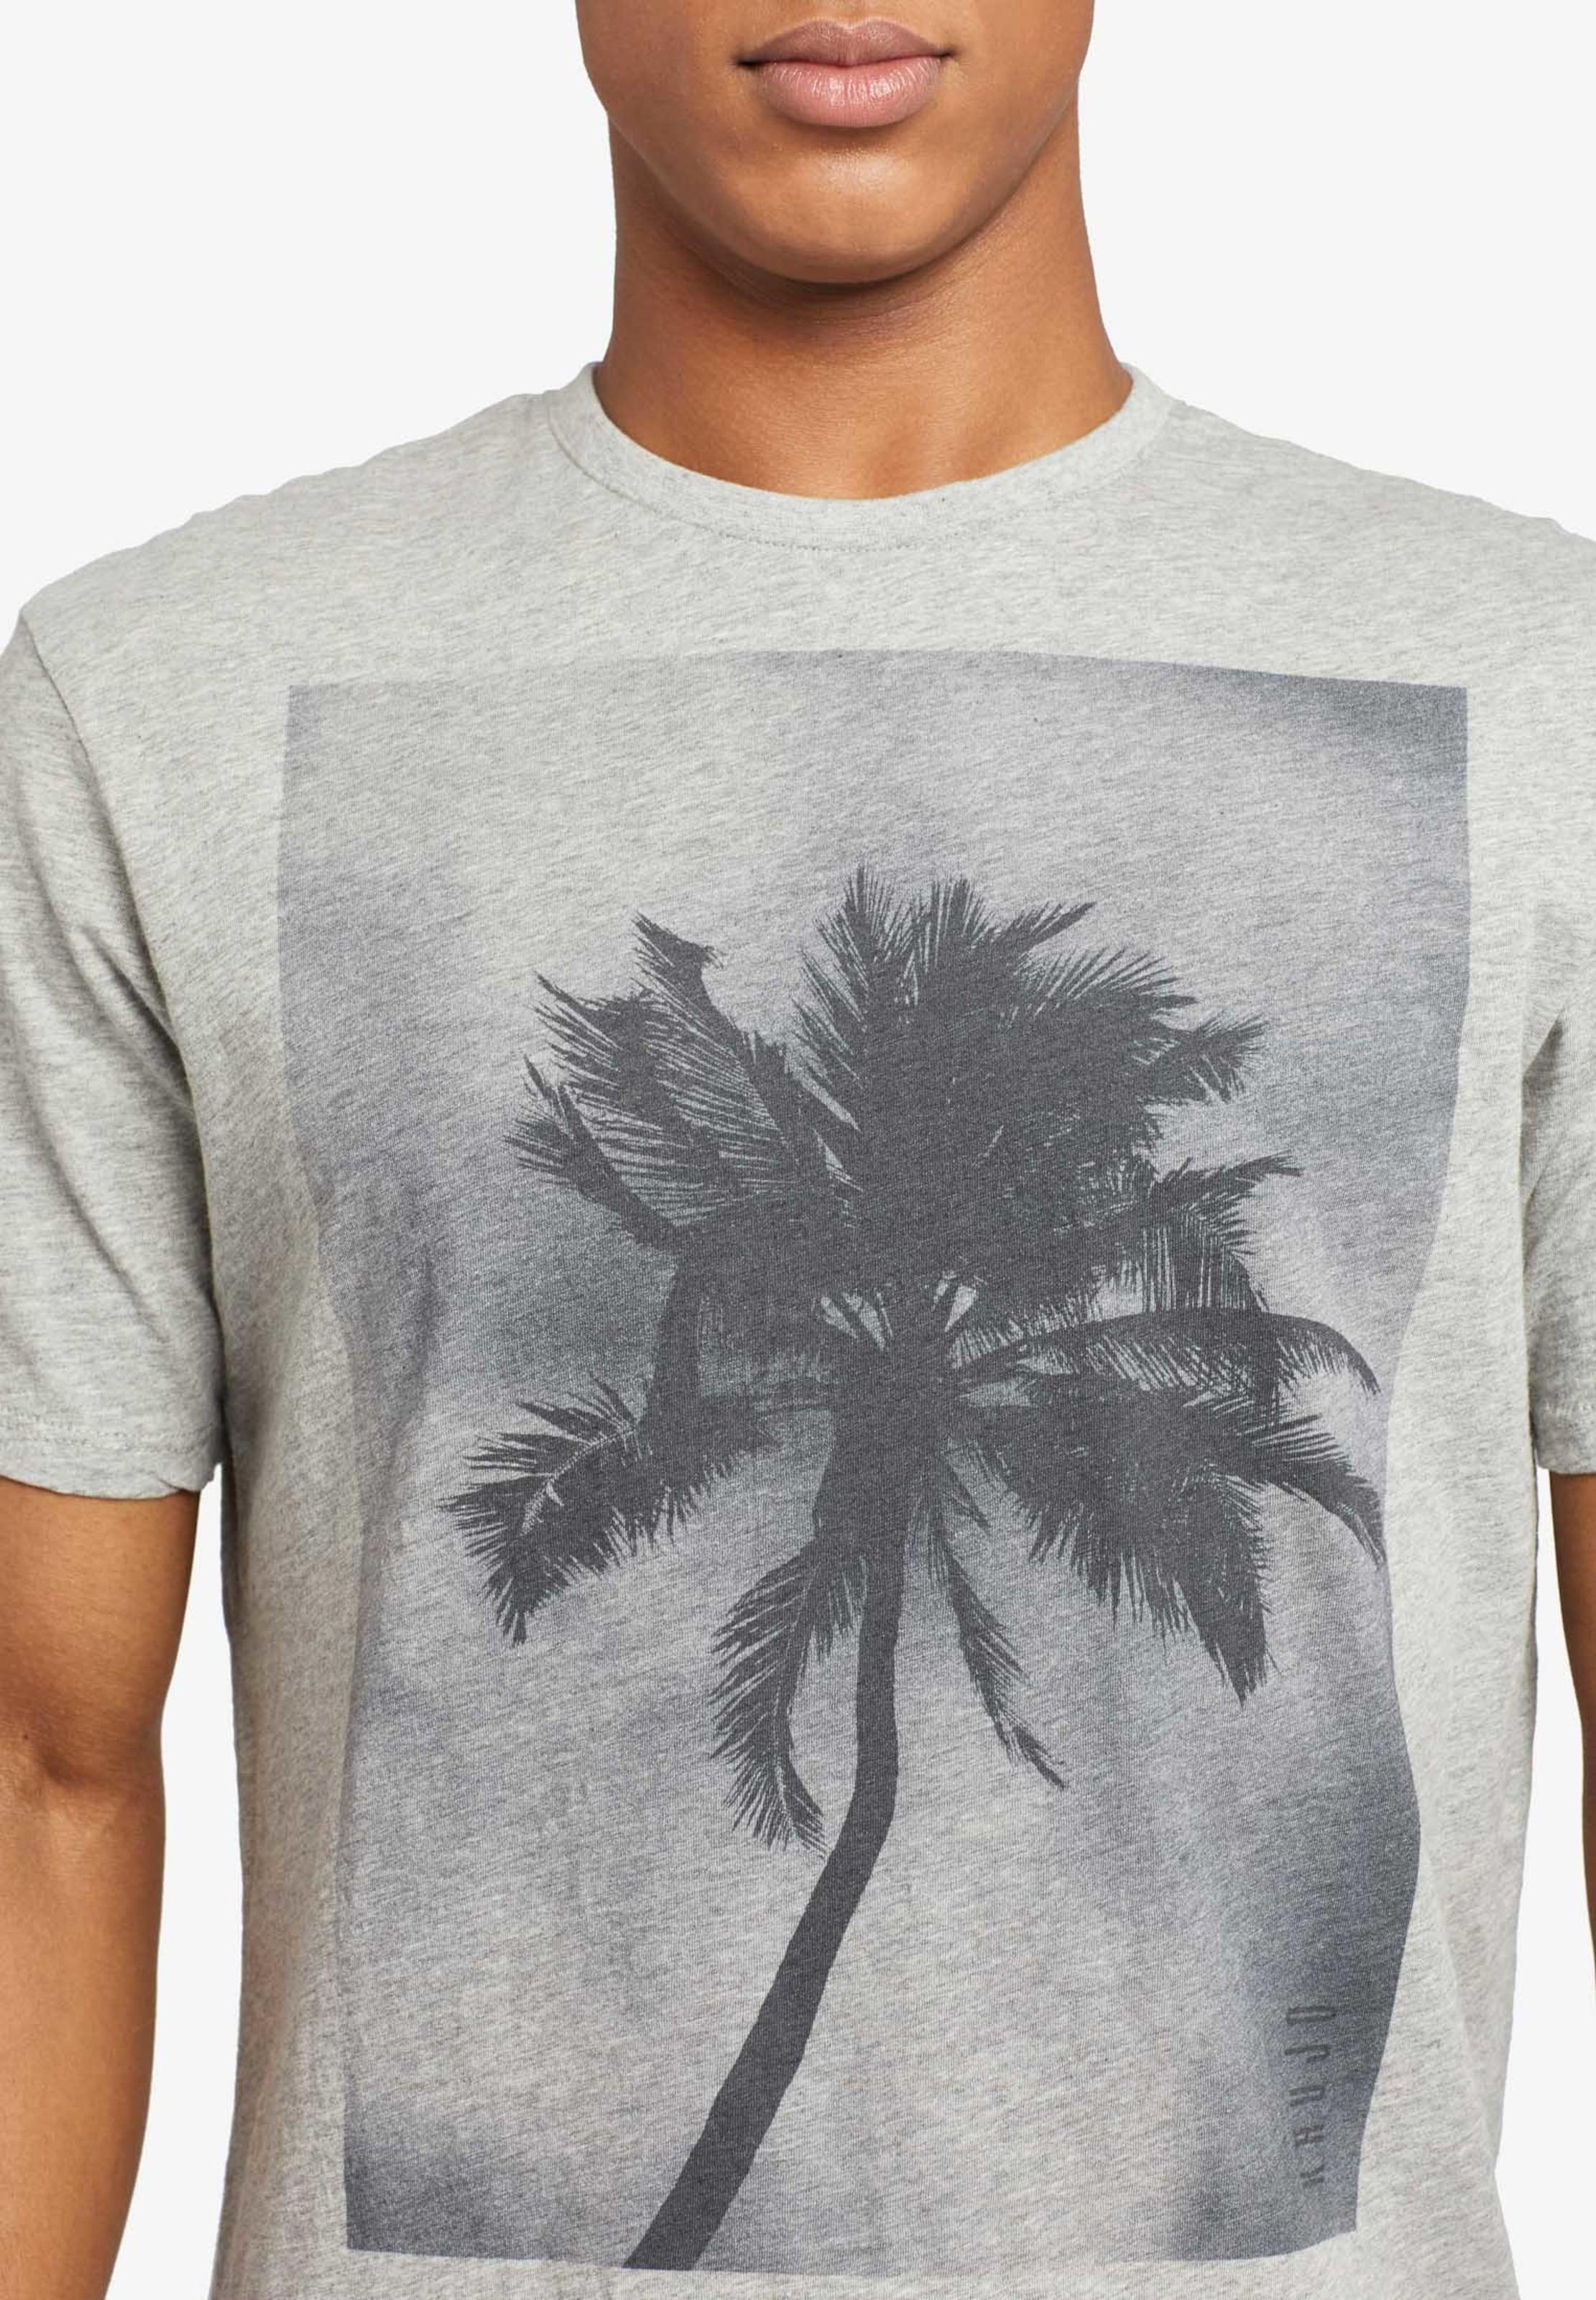 T shirt Khujo Palm' Grau 'uslo In kuPOZiX